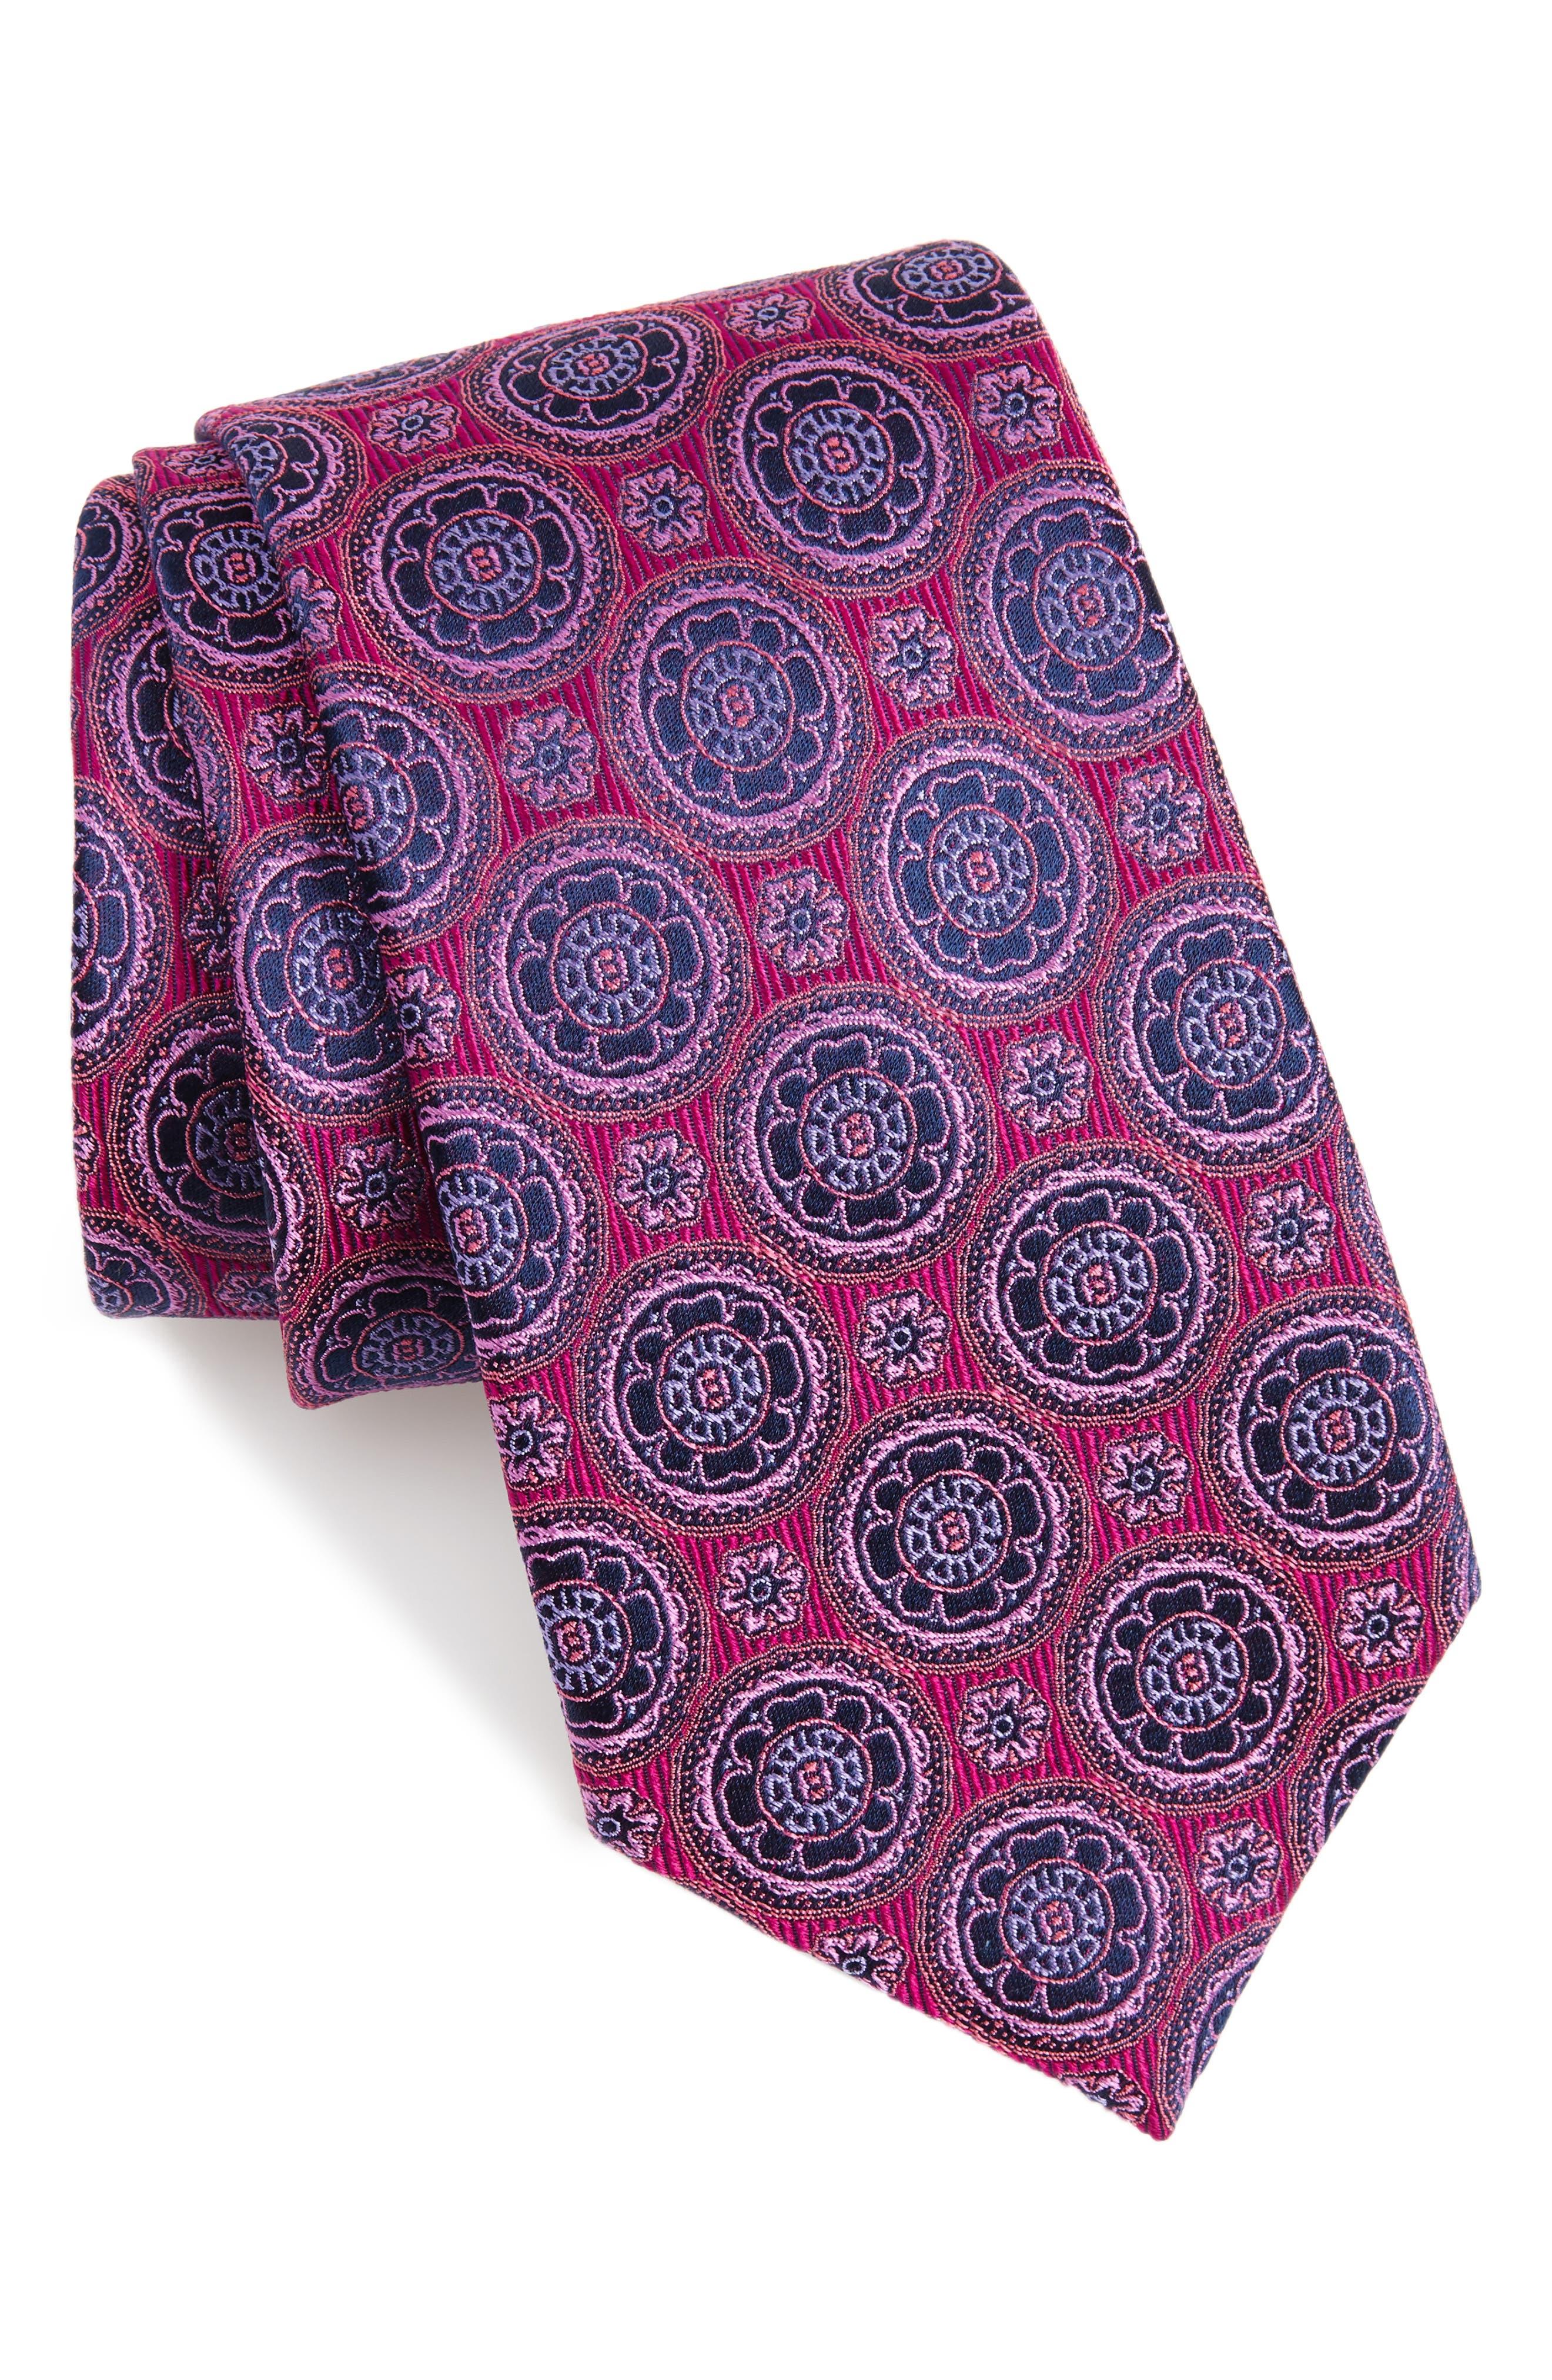 Kensington Medallion Silk Tie,                         Main,                         color, Pink